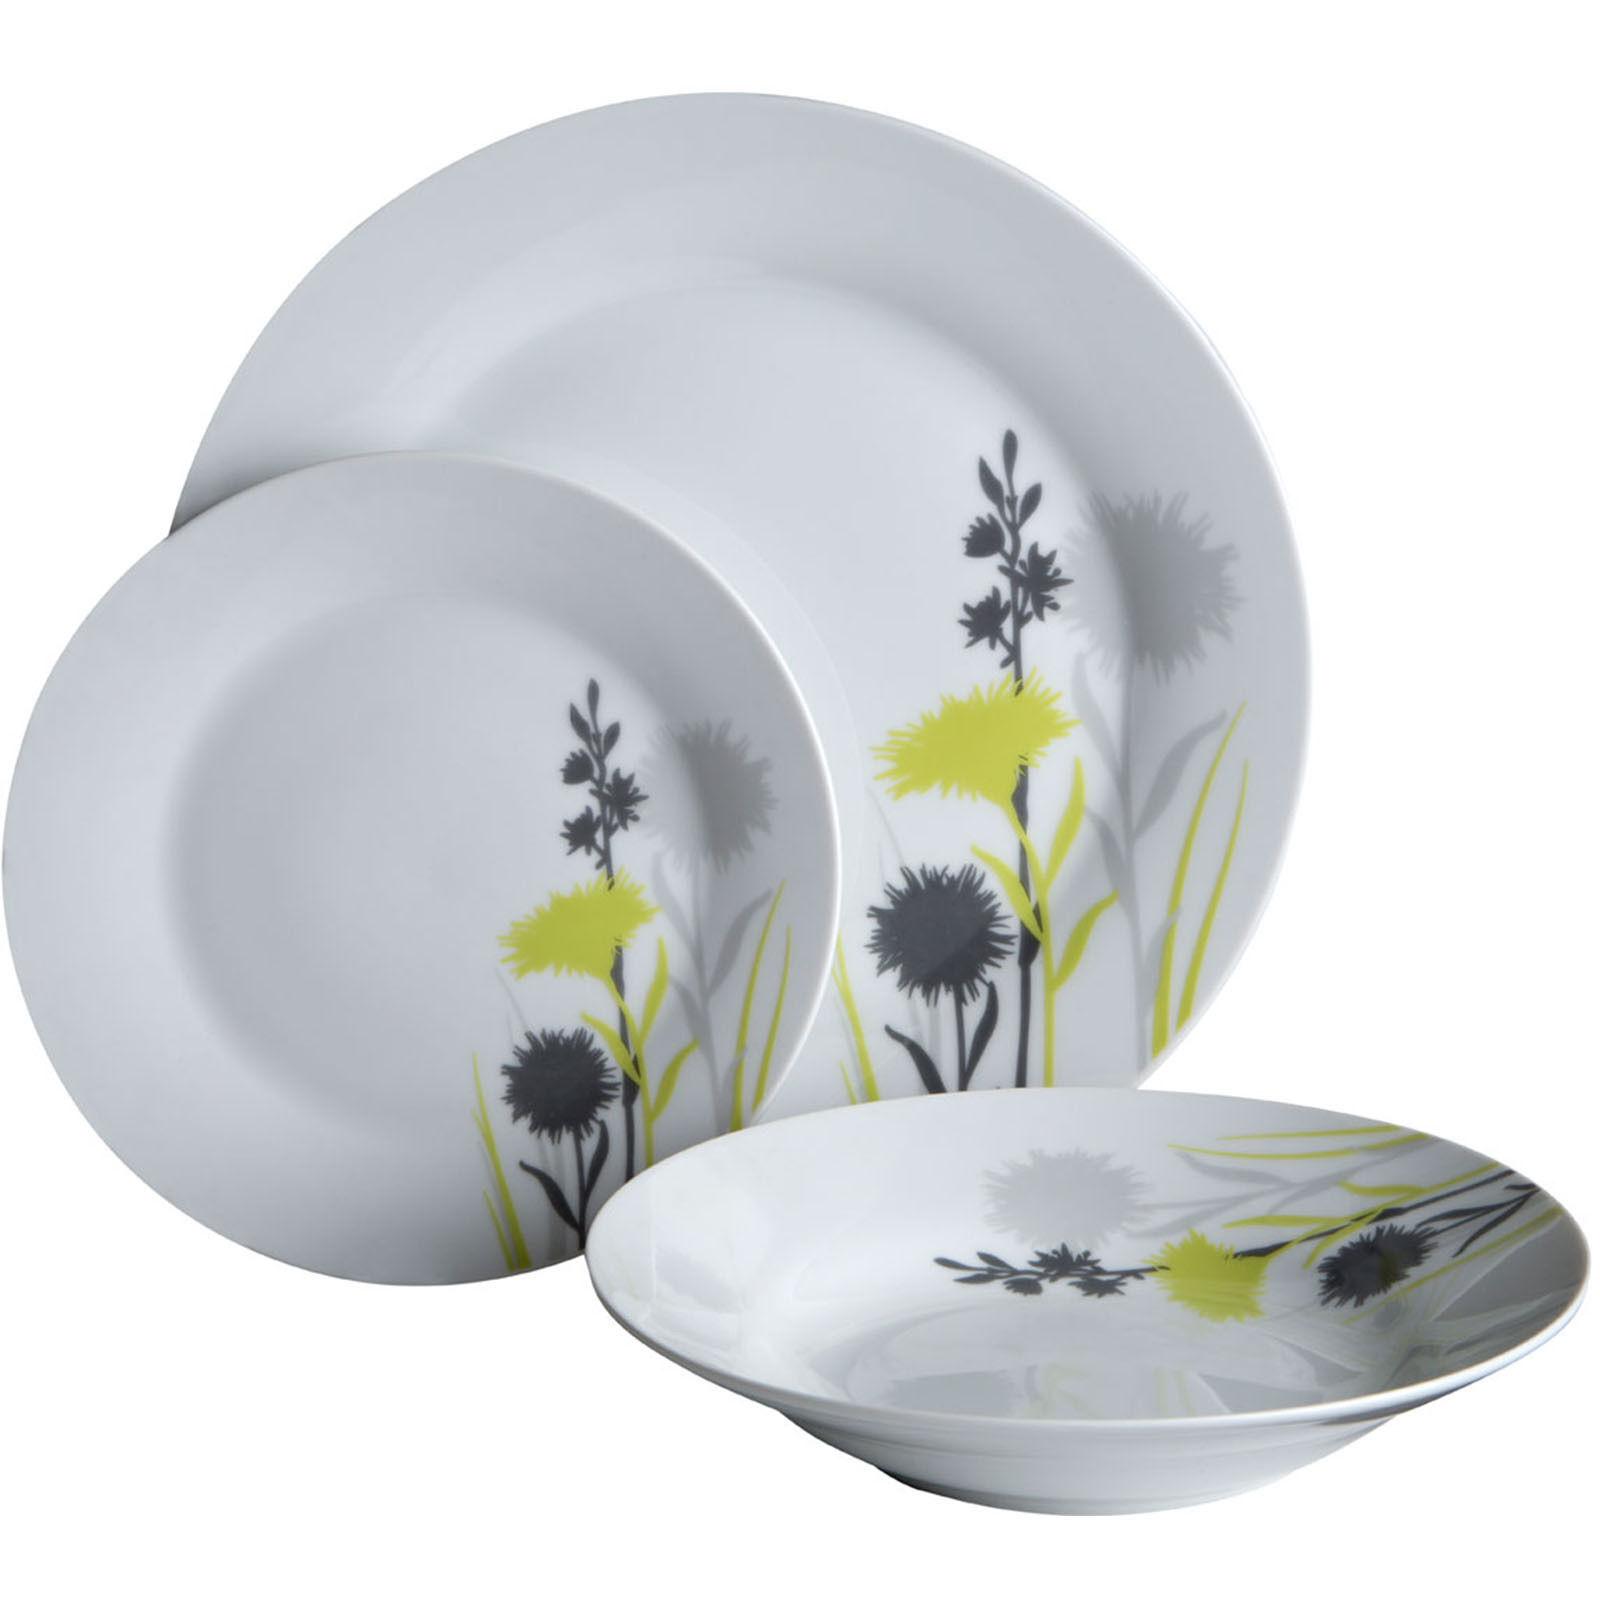 Denby Intro Soft Grey 4 Piece Pasta Bowl Set Stoneware Tableware Dinnerware